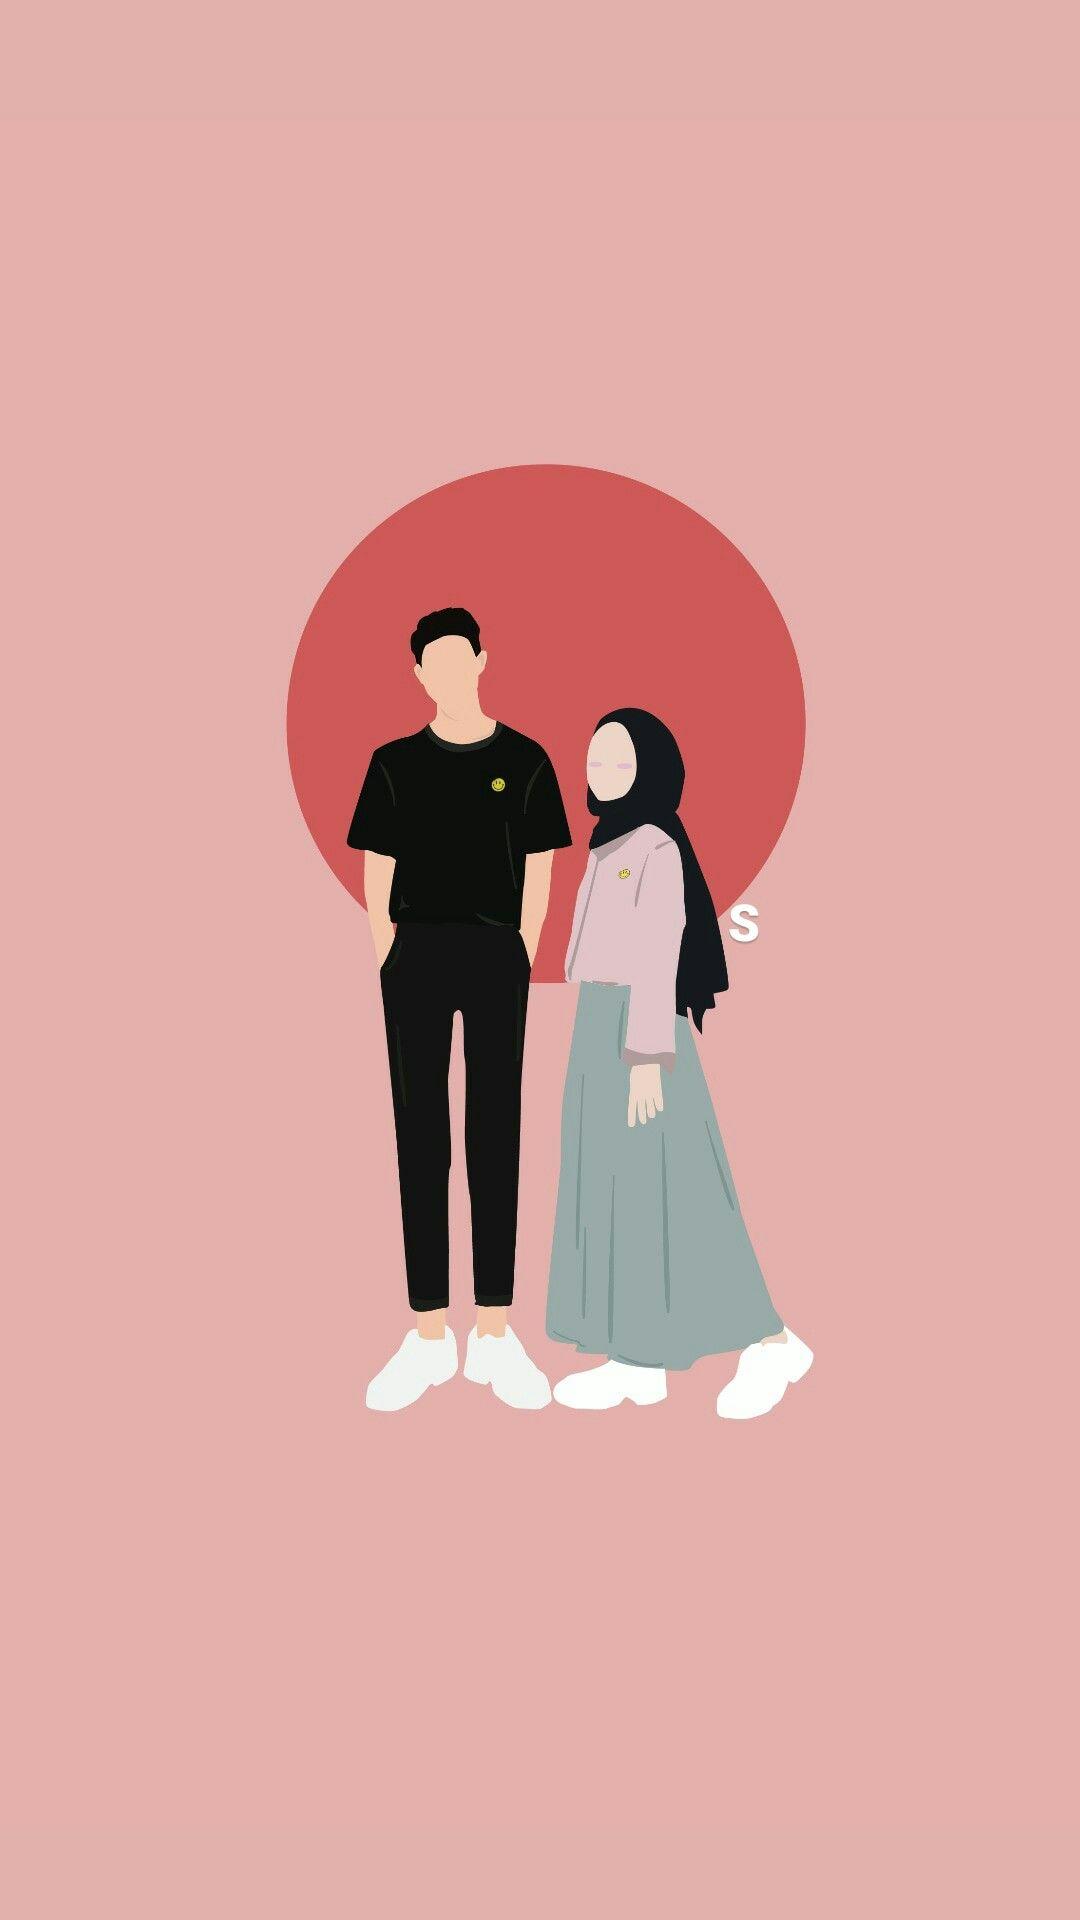 Pin Oleh Tee Di Vector Art Ilustrasi Karakter Gambar Karakter Ilustrasi Anime couple aesthetic wallpaper